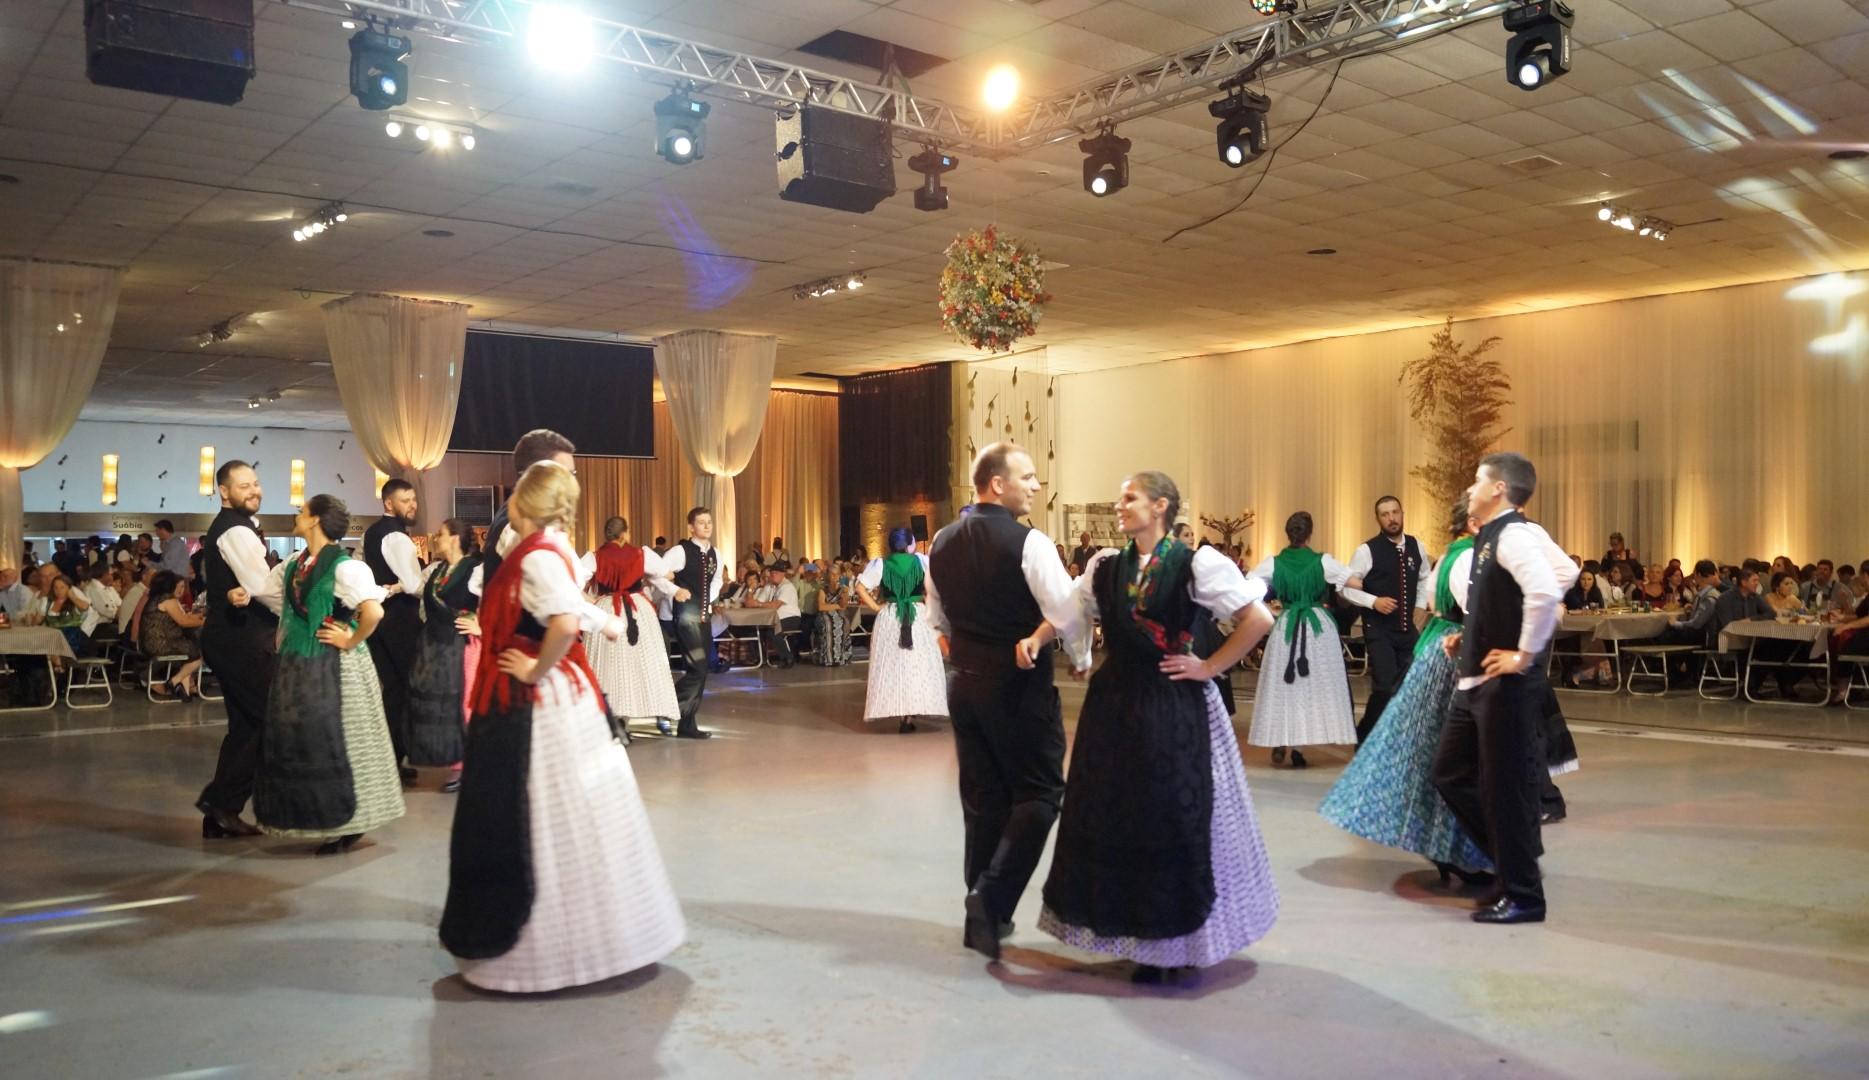 Festa da Cevada - Baile - 05/10/2019Festa da Cevada - Baile - 05/10/2019